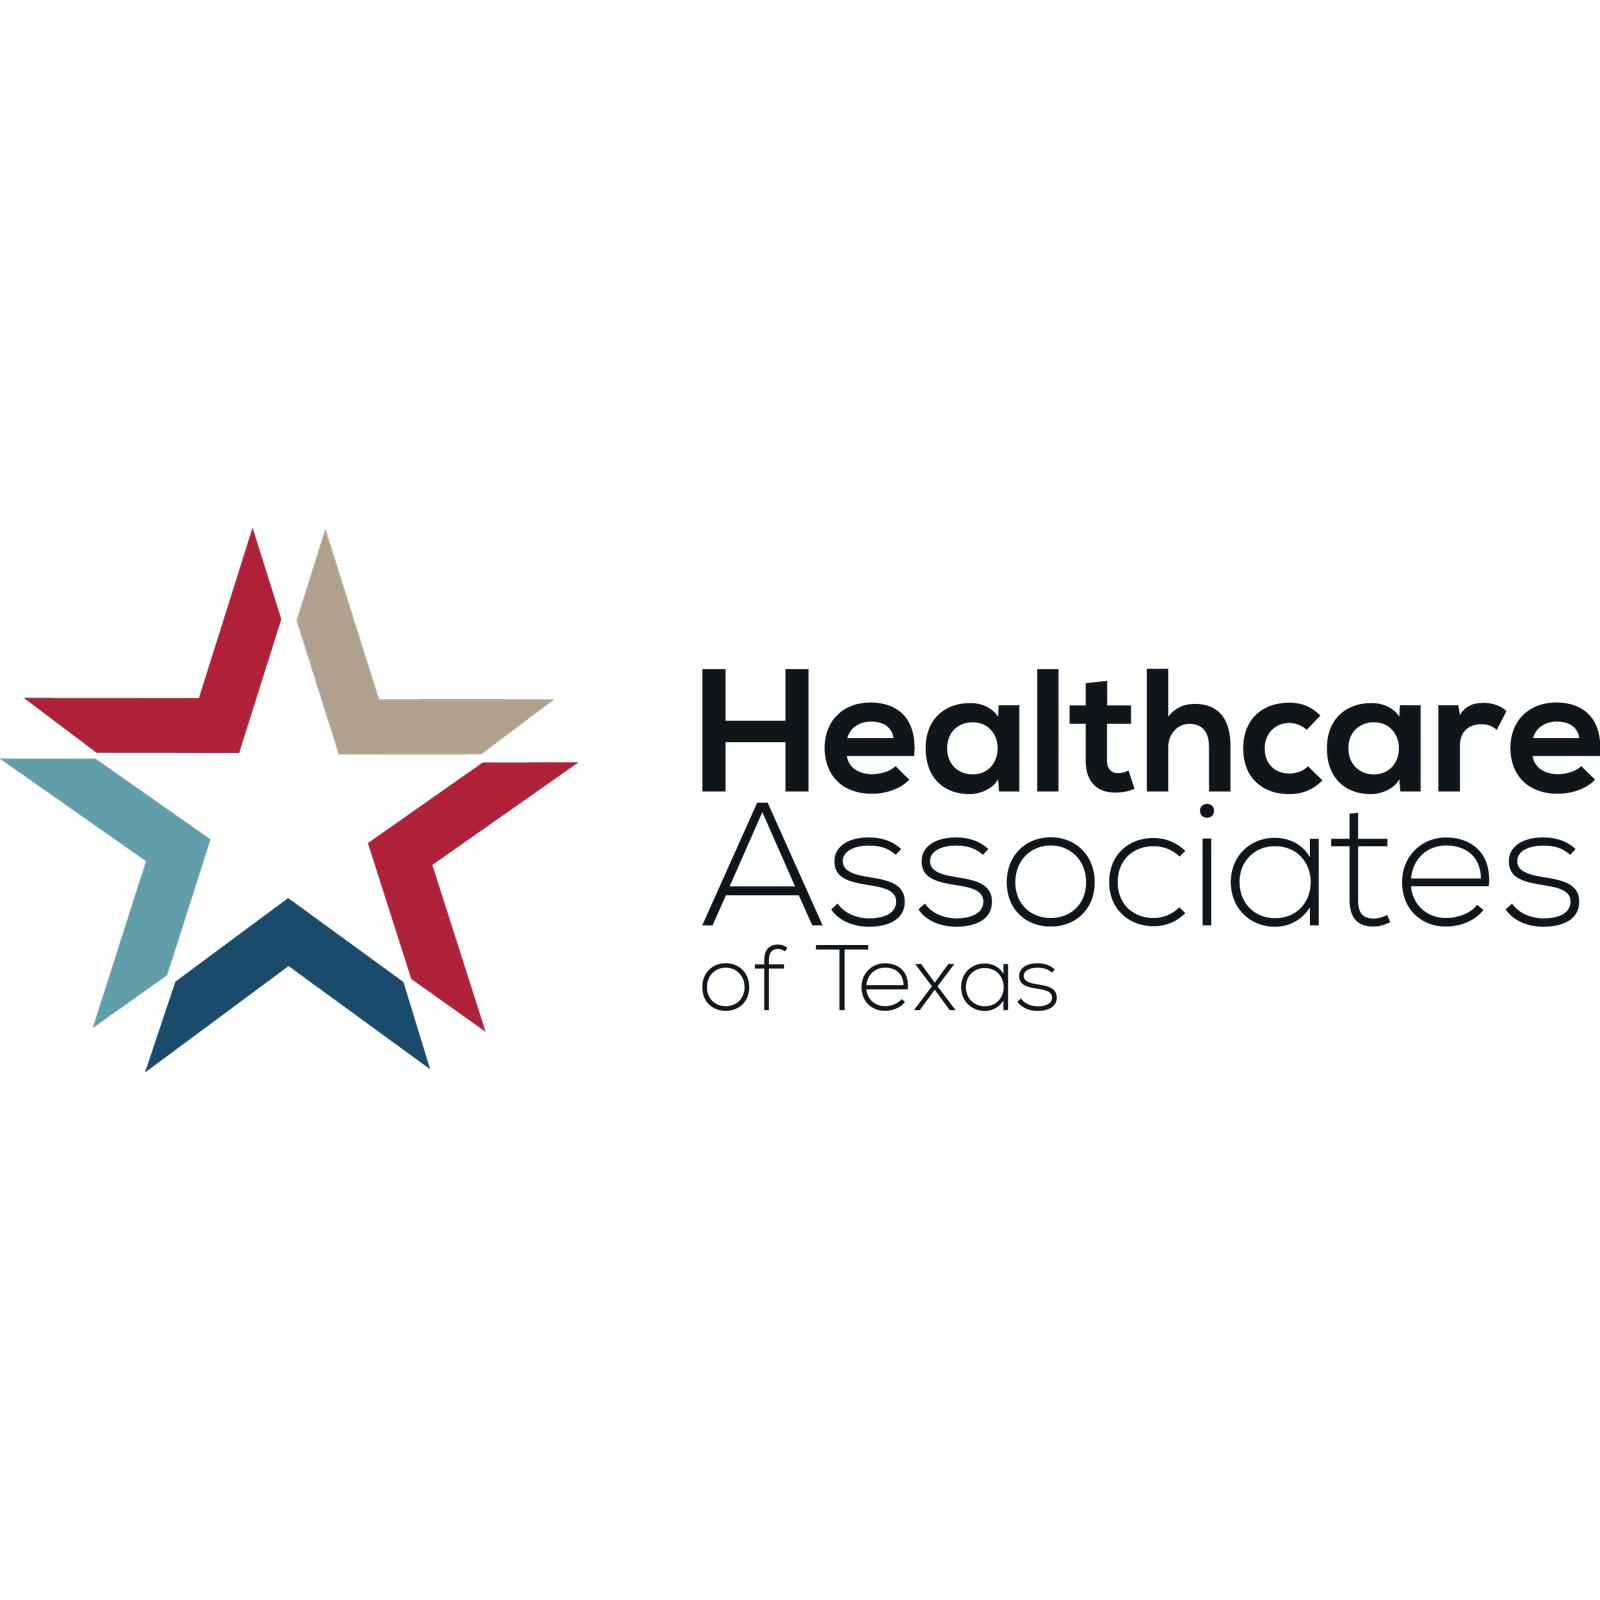 Healthcare Associates of Texas image 3